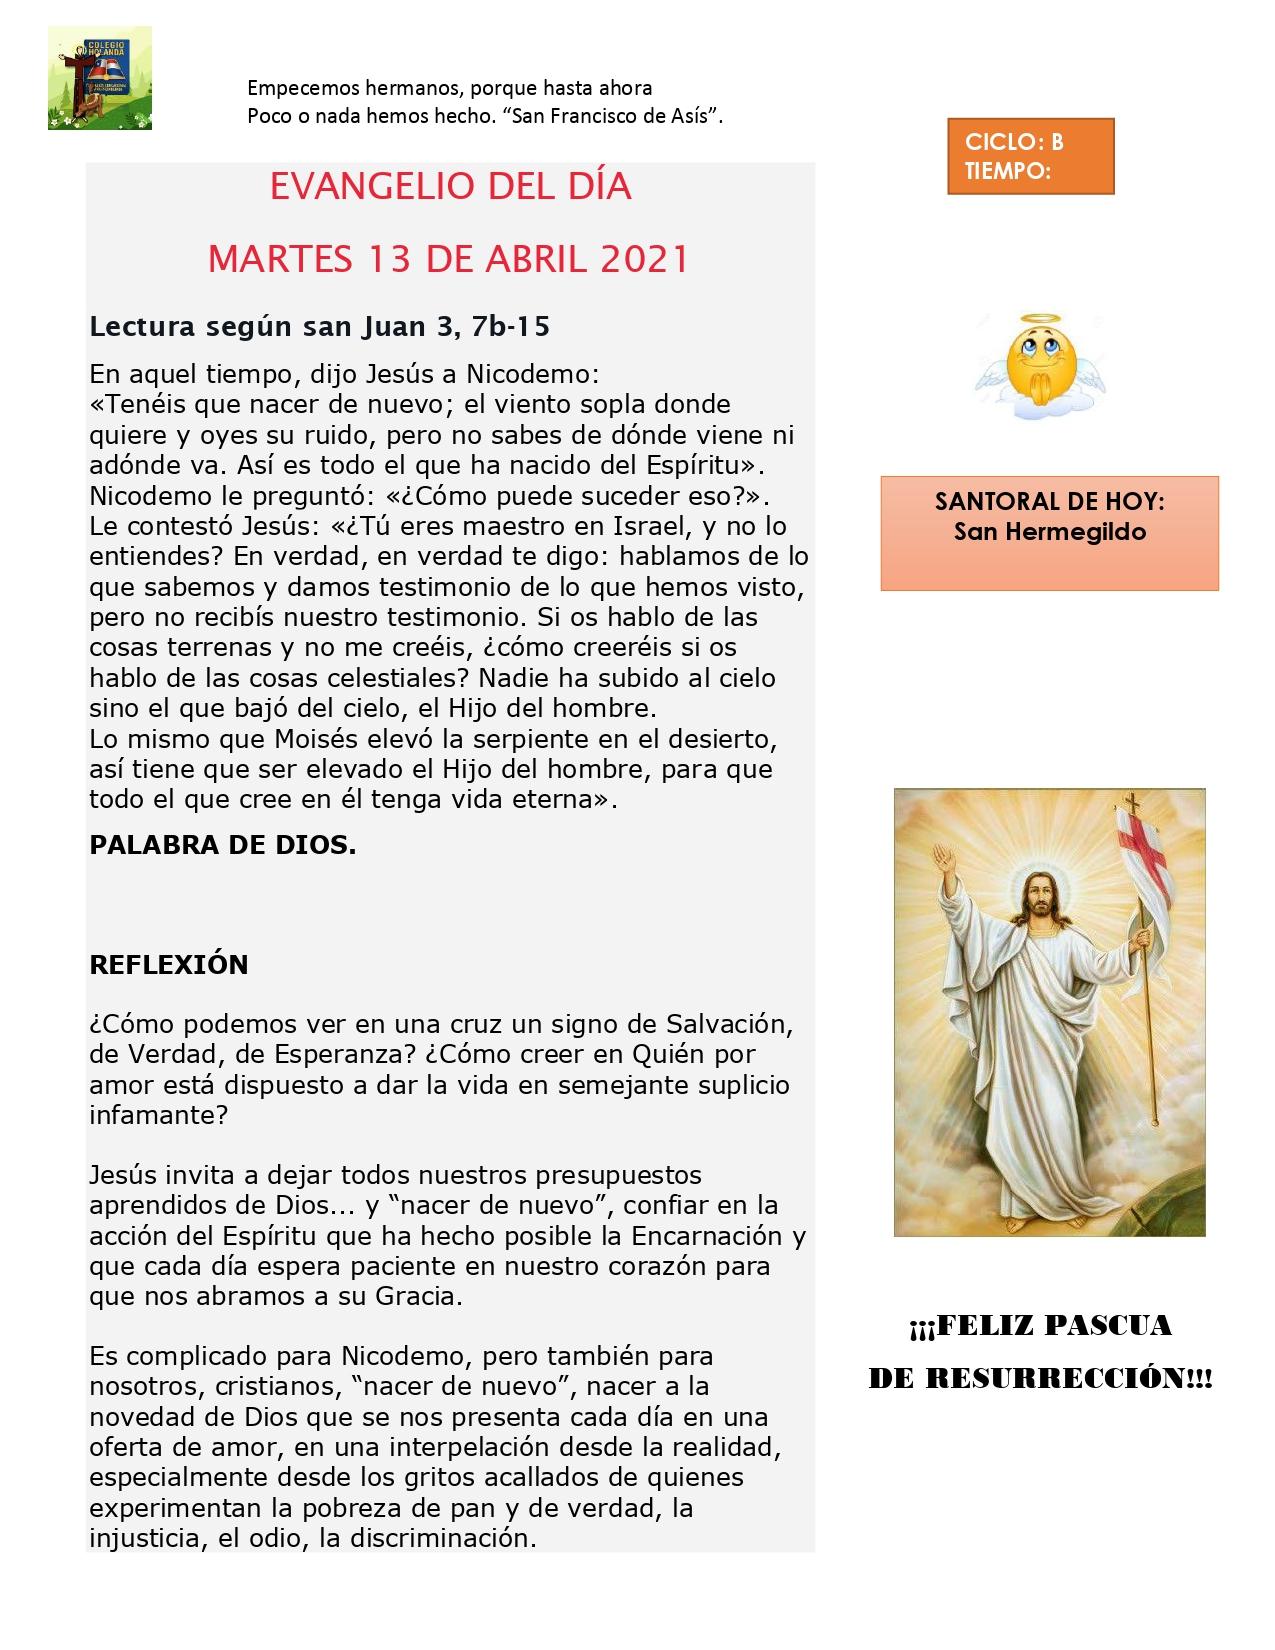 MARTES 13 DE ABRIL 2021_page-0001